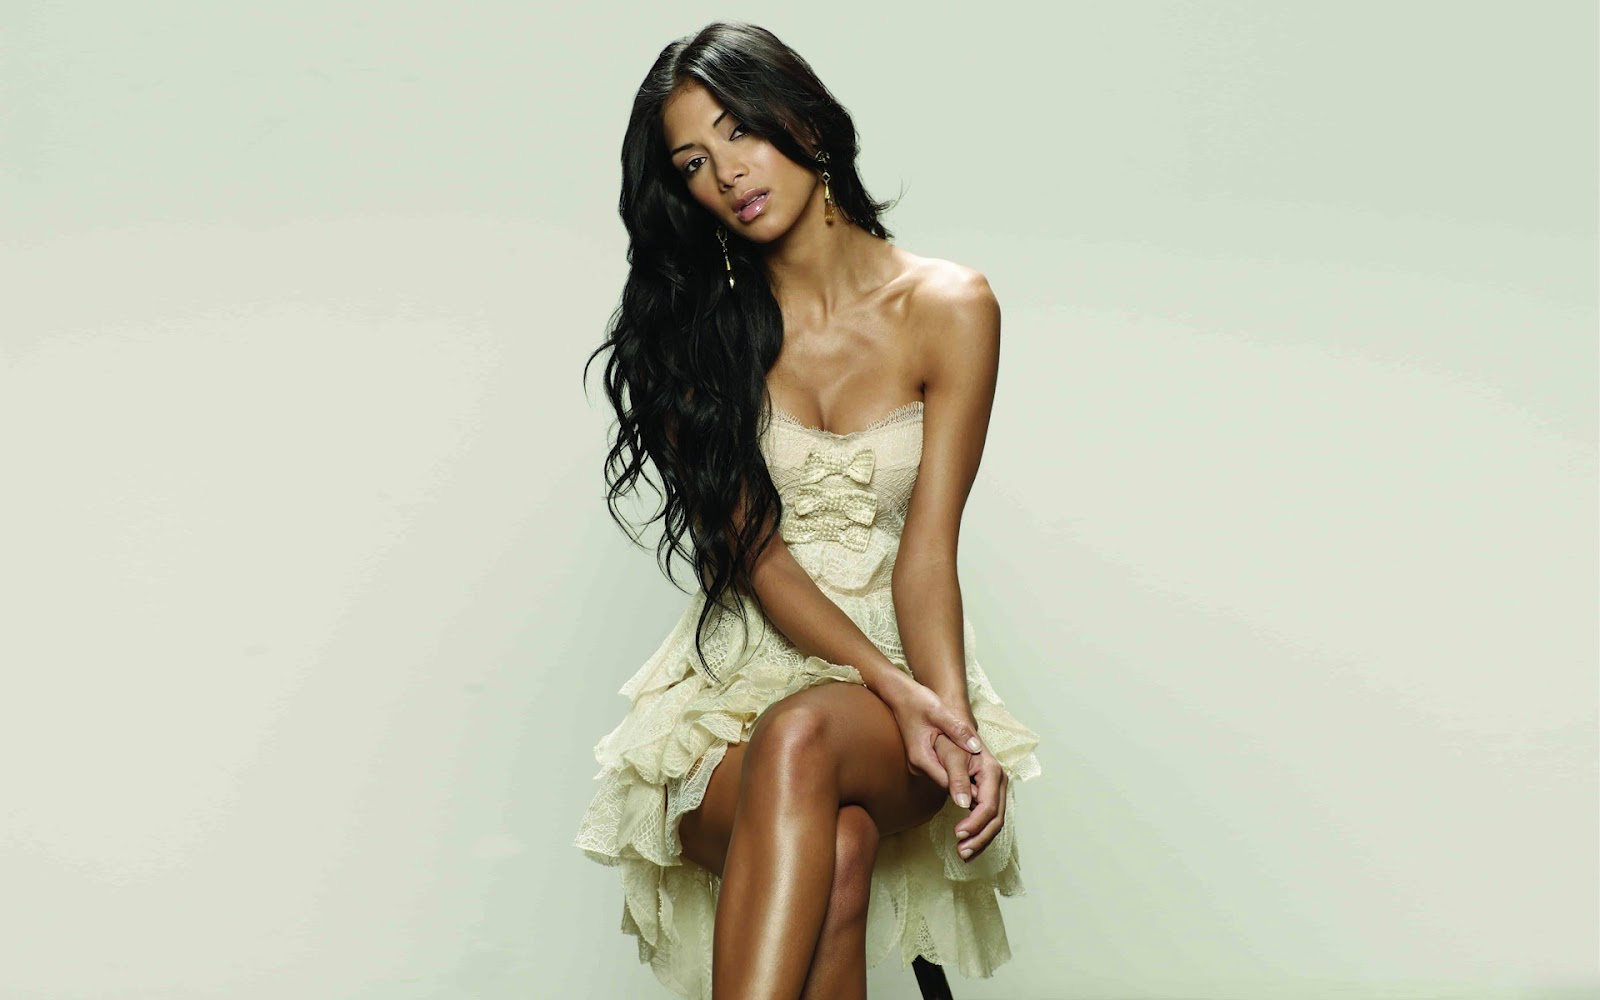 http://4.bp.blogspot.com/-XGAZtE5u540/T2Yd1M5ygxI/AAAAAAAAXHs/kR_S95IaS5c/s1600/Nicole-Scherzinger_HD_06.jpg